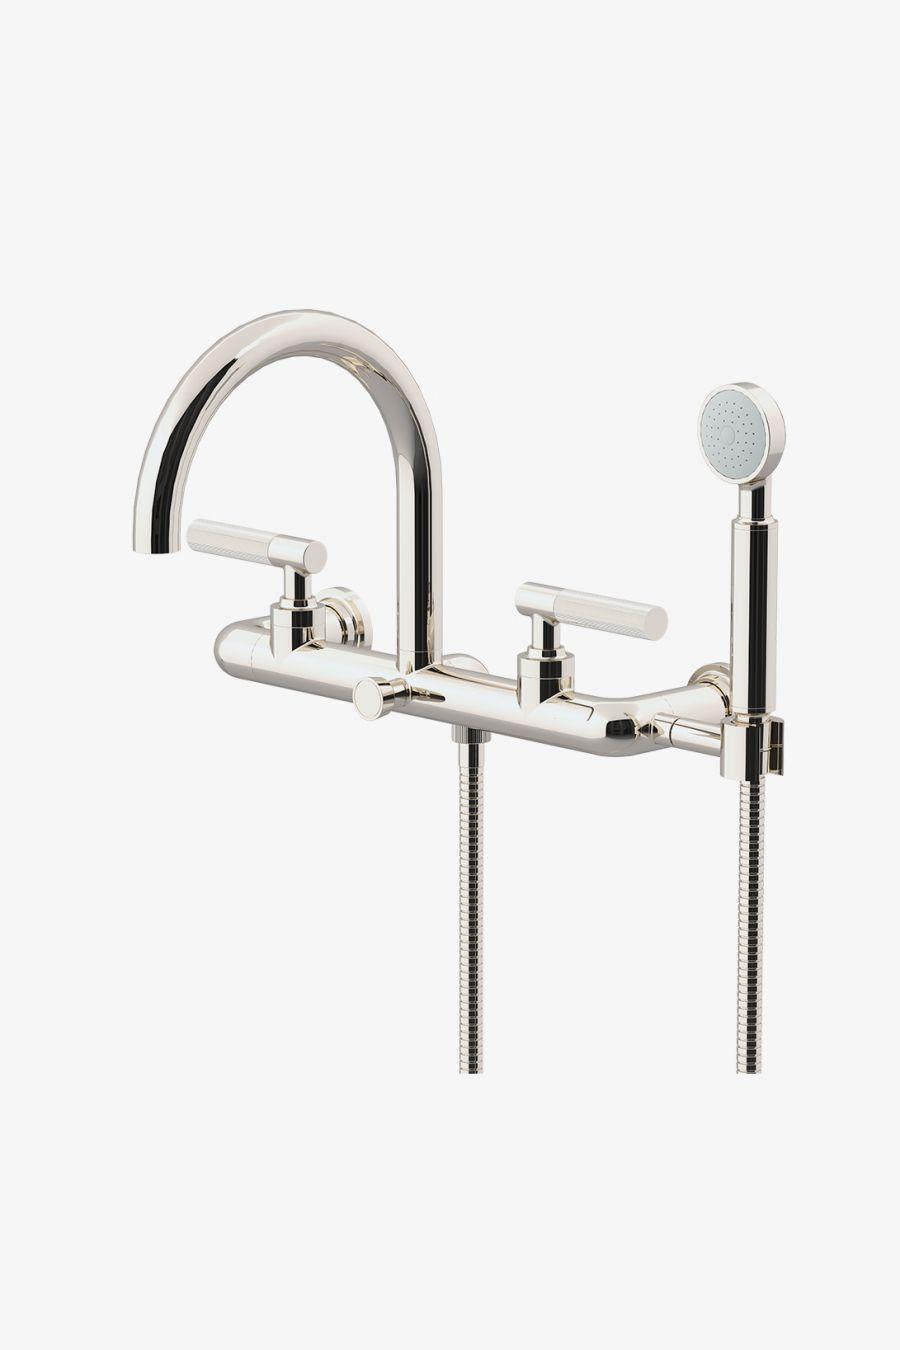 tub filler hand shower bathtub faucet